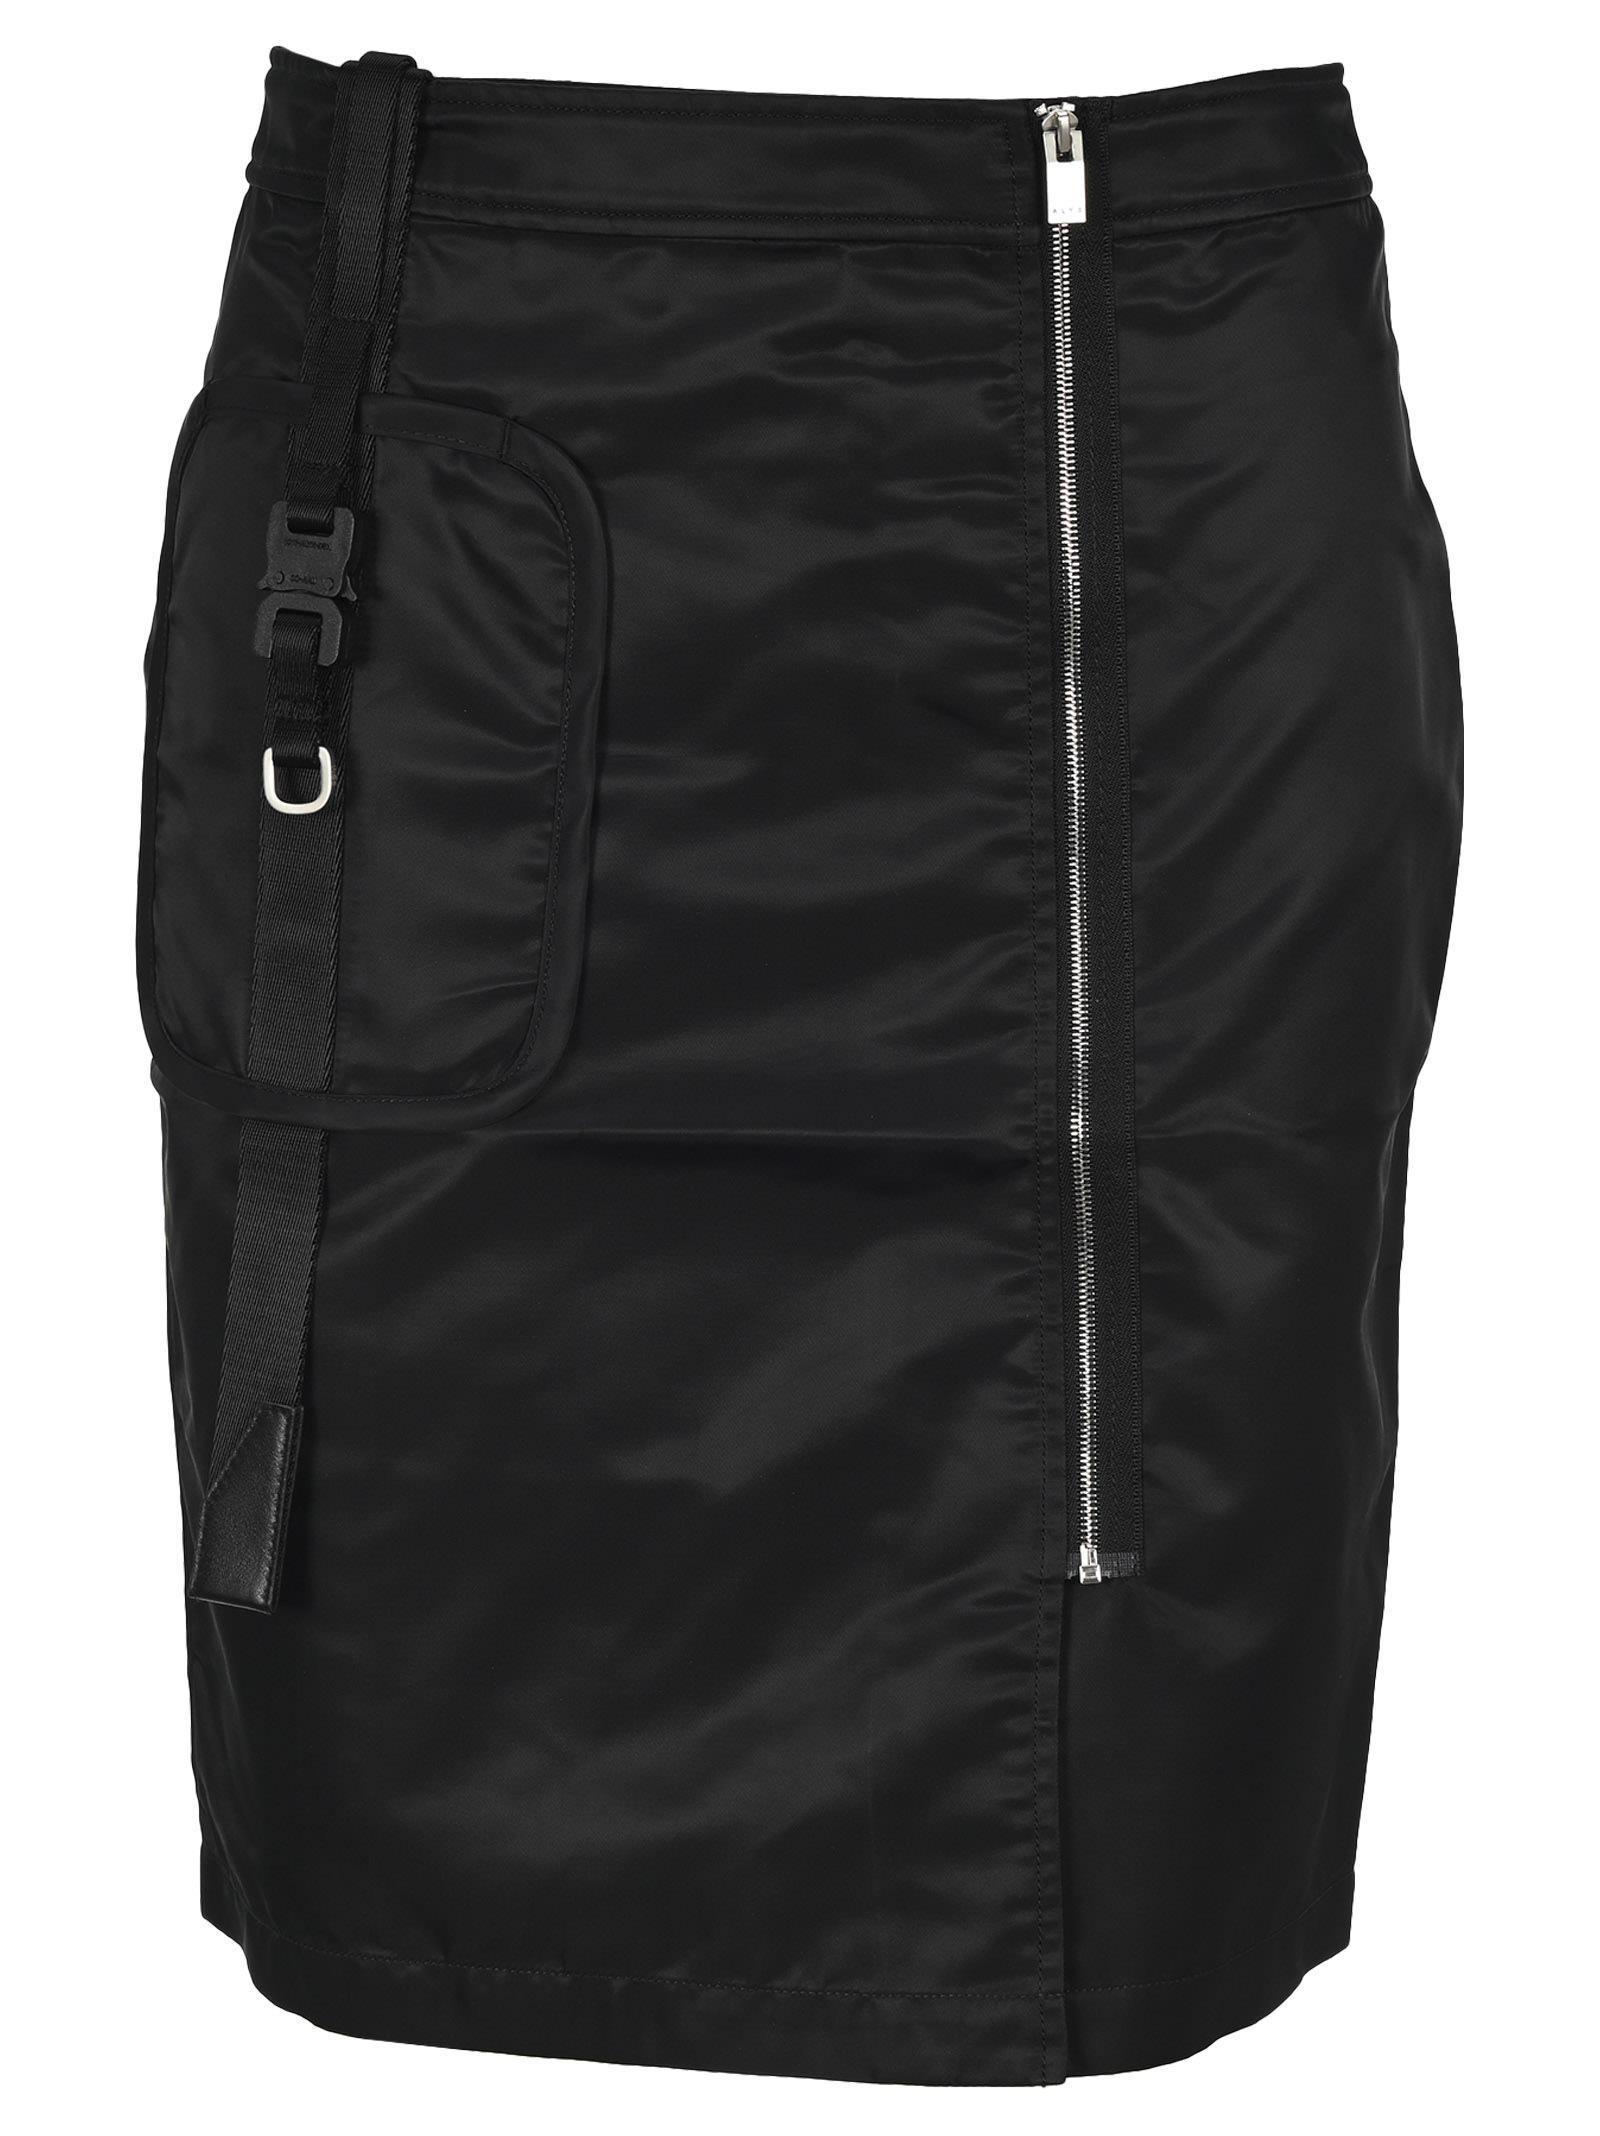 Alyx Buckle Detail Skirt